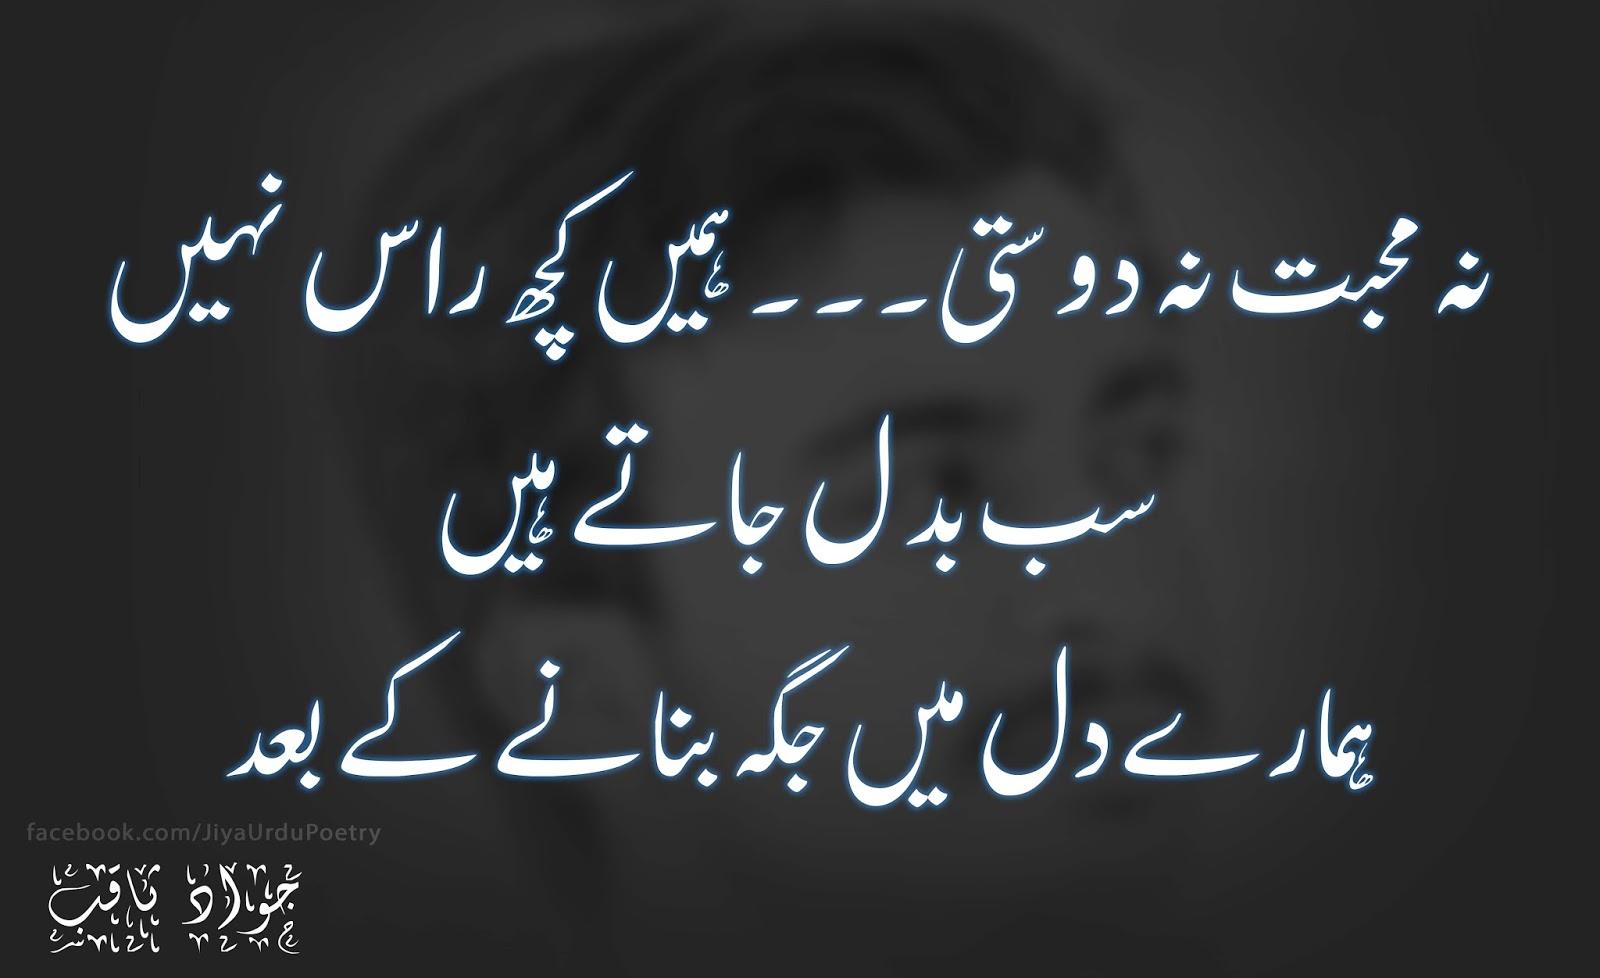 Urdu Shayari Poetry